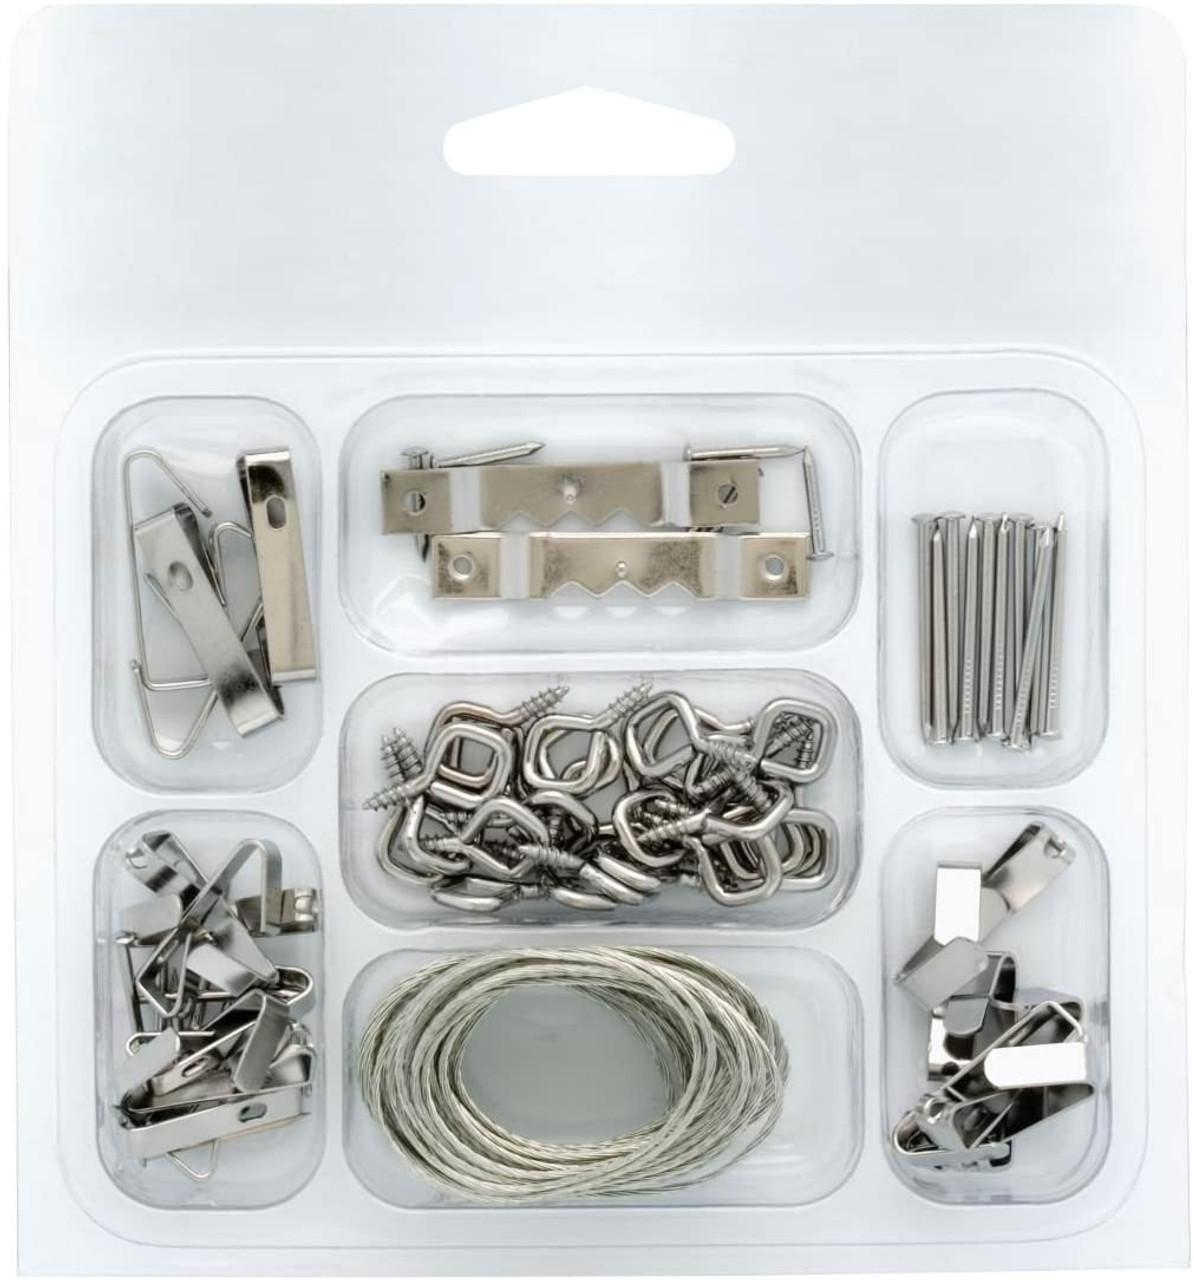 Project Basics 129700 46 Piece Light & Medium Duty Picture Hanger Kit